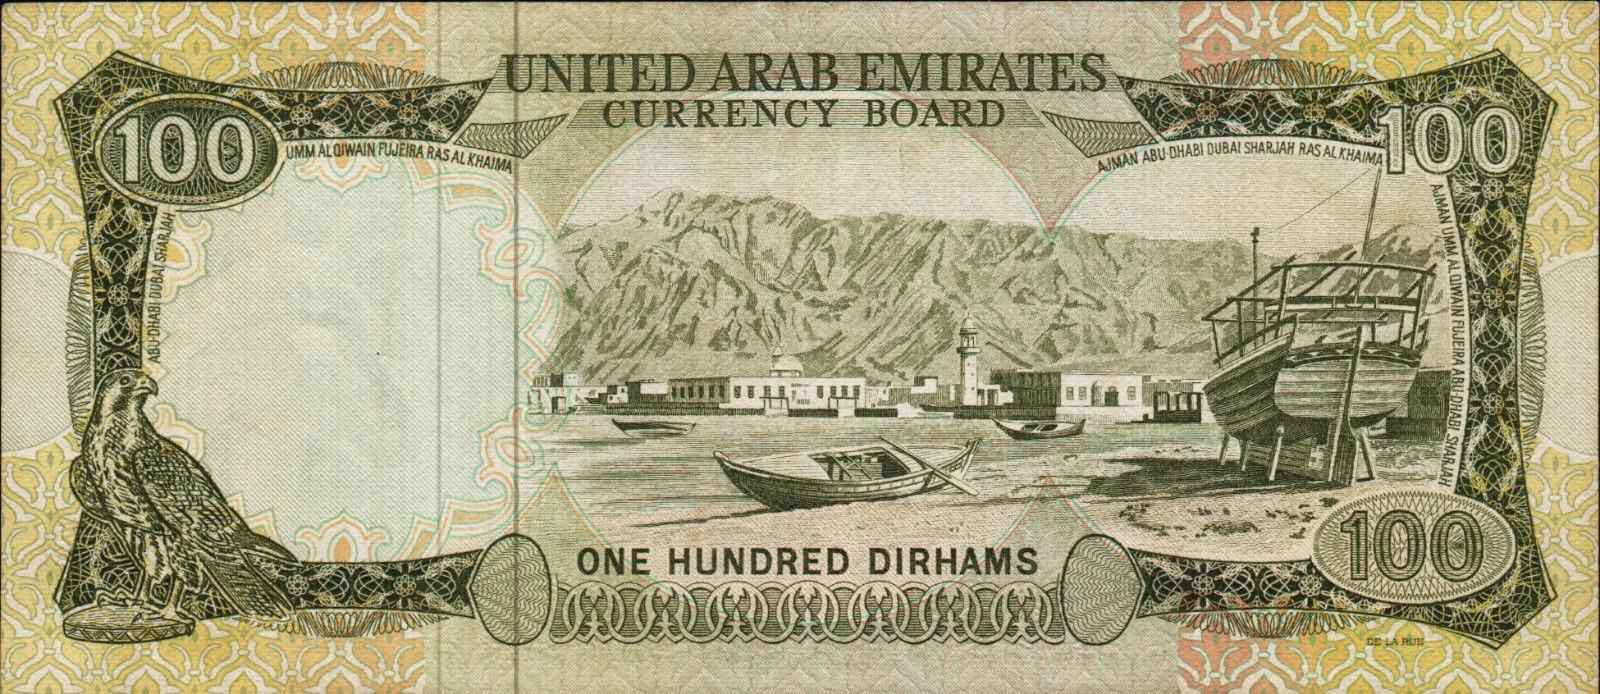 United Arab Emirates currency 100 Dirhams note bill